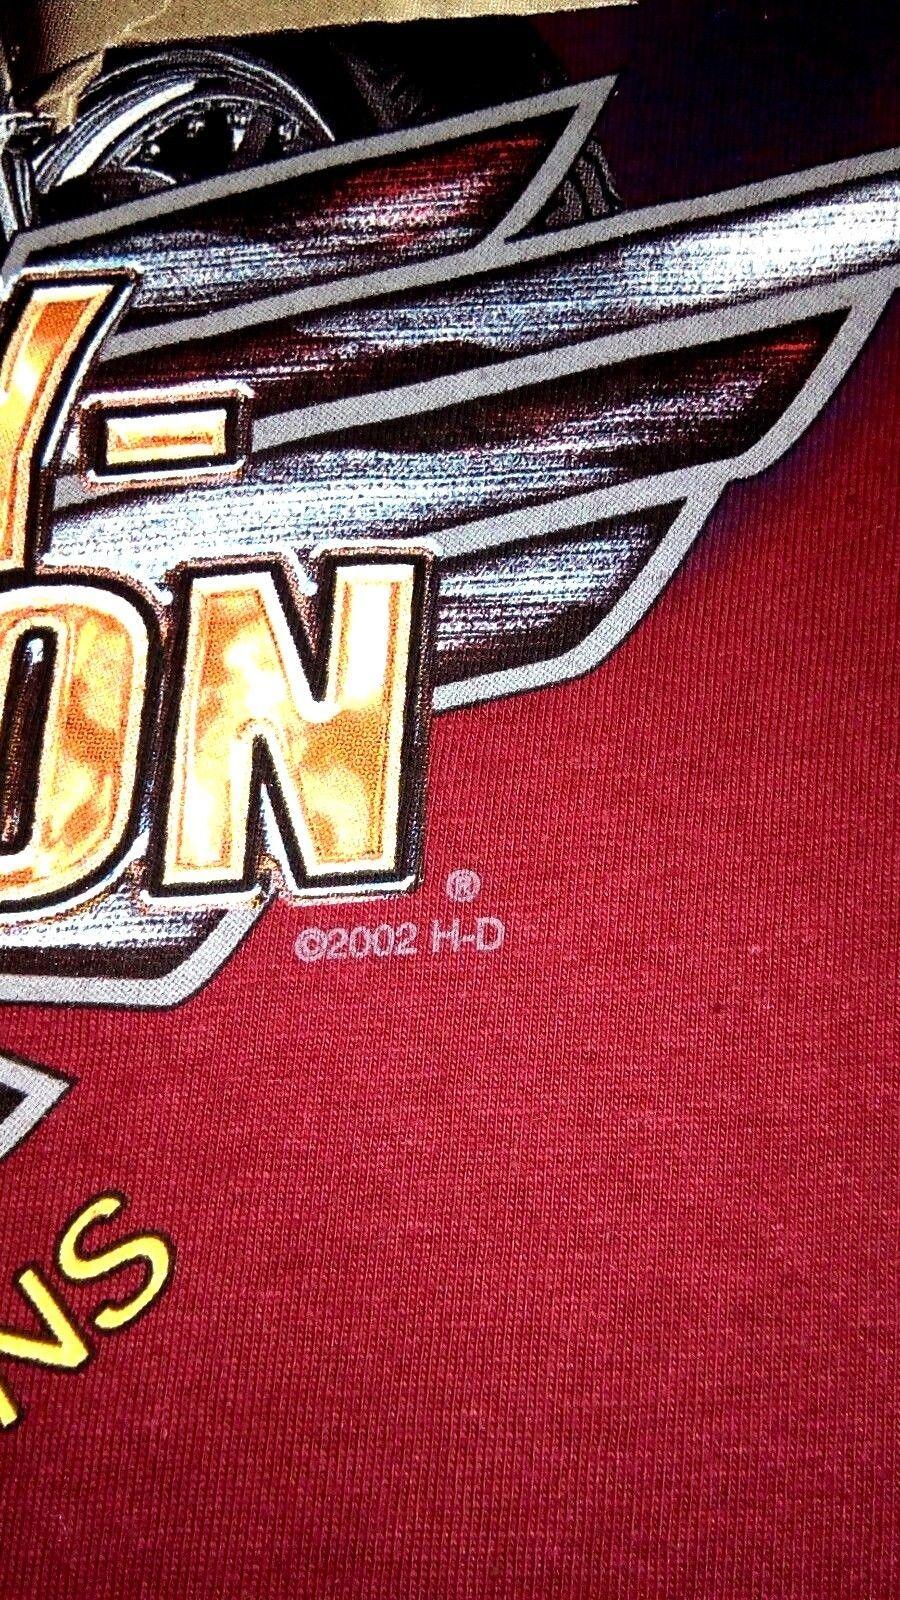 NWOT Harley Davidson York Vehicle Operations 2002 Men's L Red Hanes Beefy TShirt image 5